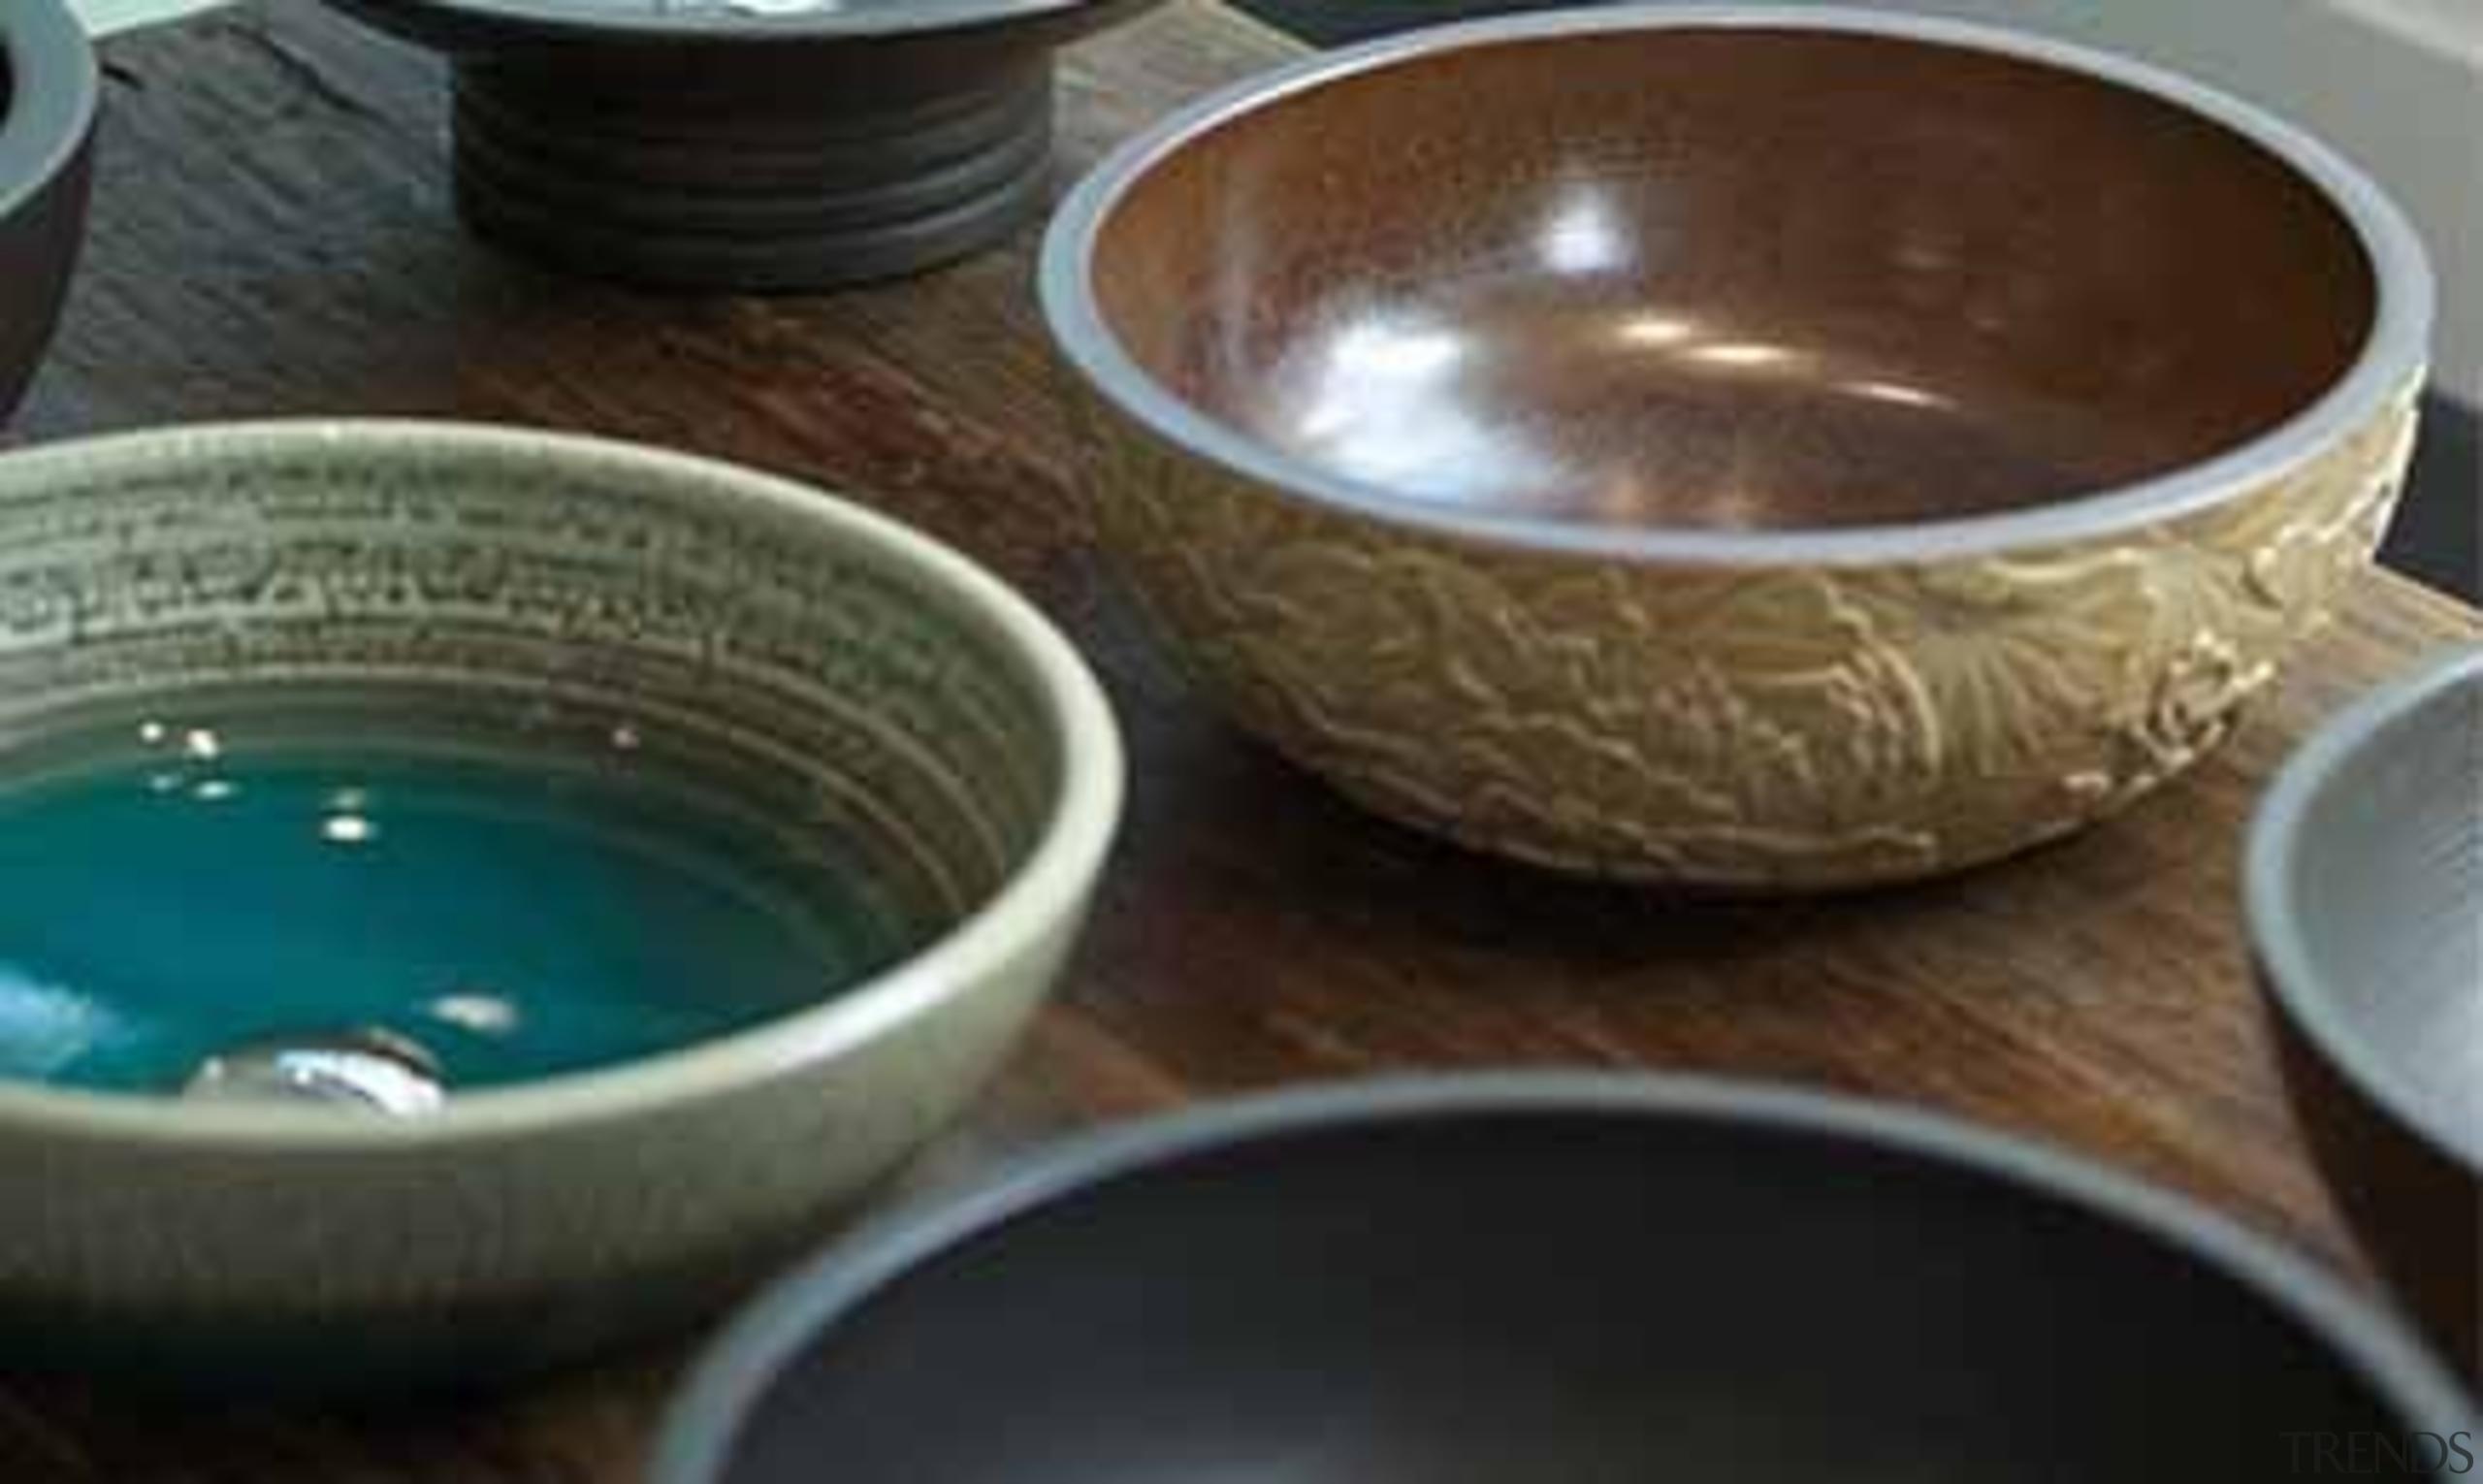 See more here bowl, ceramic, dishware, pottery, tableware, brown, black